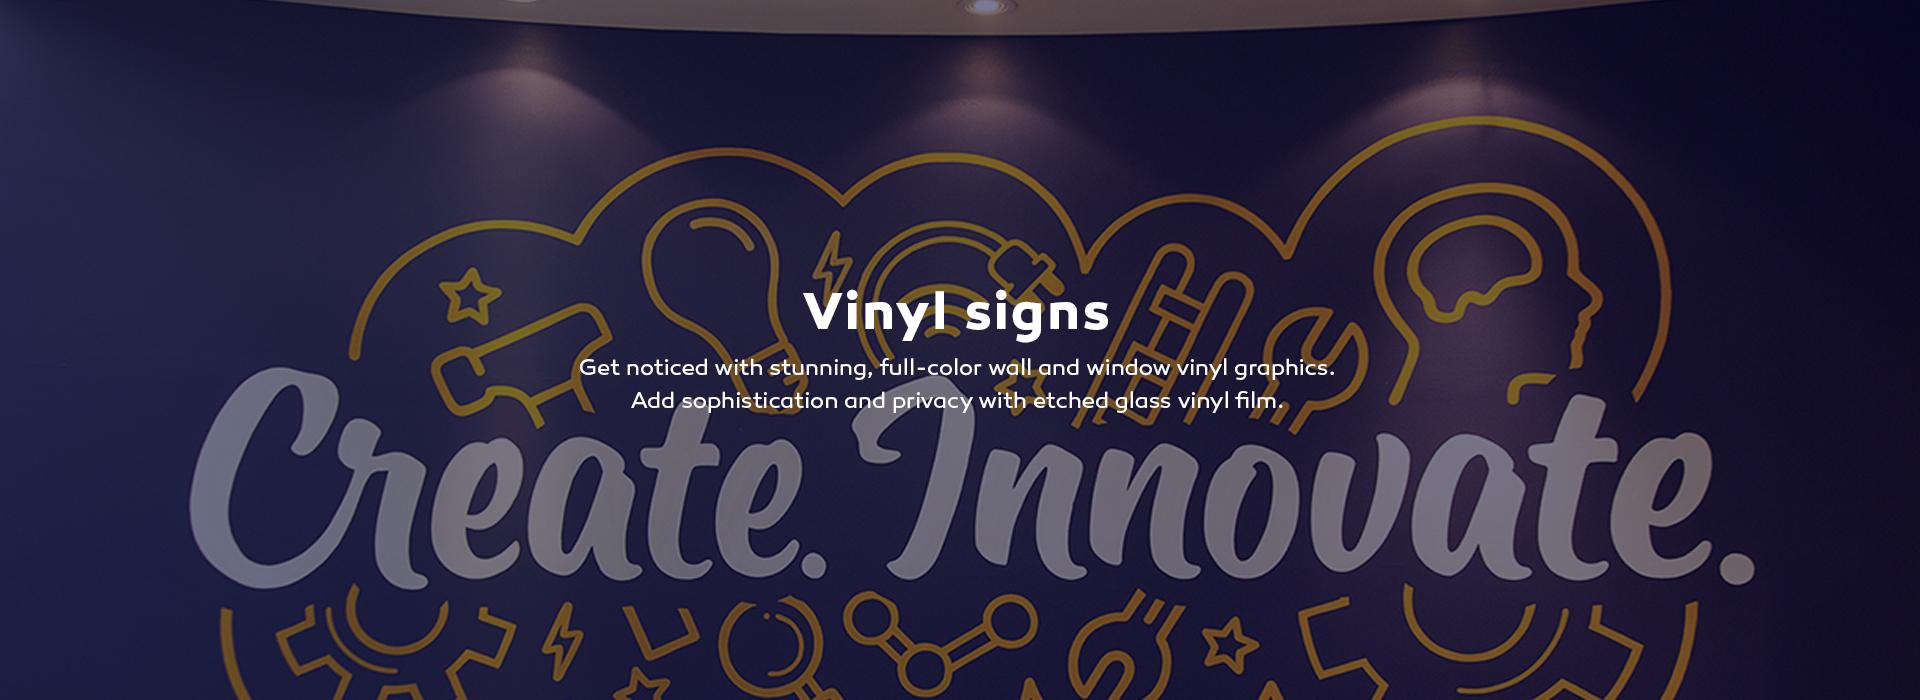 Vinyl signs, wall murals.